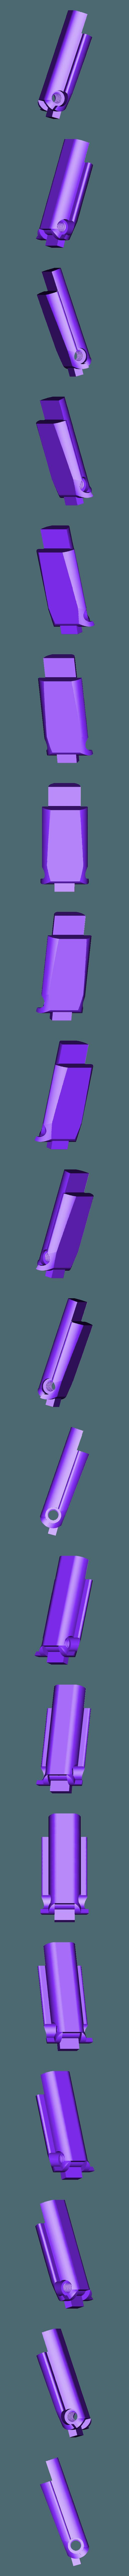 Mosqueton Spartan Carabiner Traba.stl Download STL file Carabiner / Carabineer - Spartan Carabiner - • 3D printable design, CHKDesign